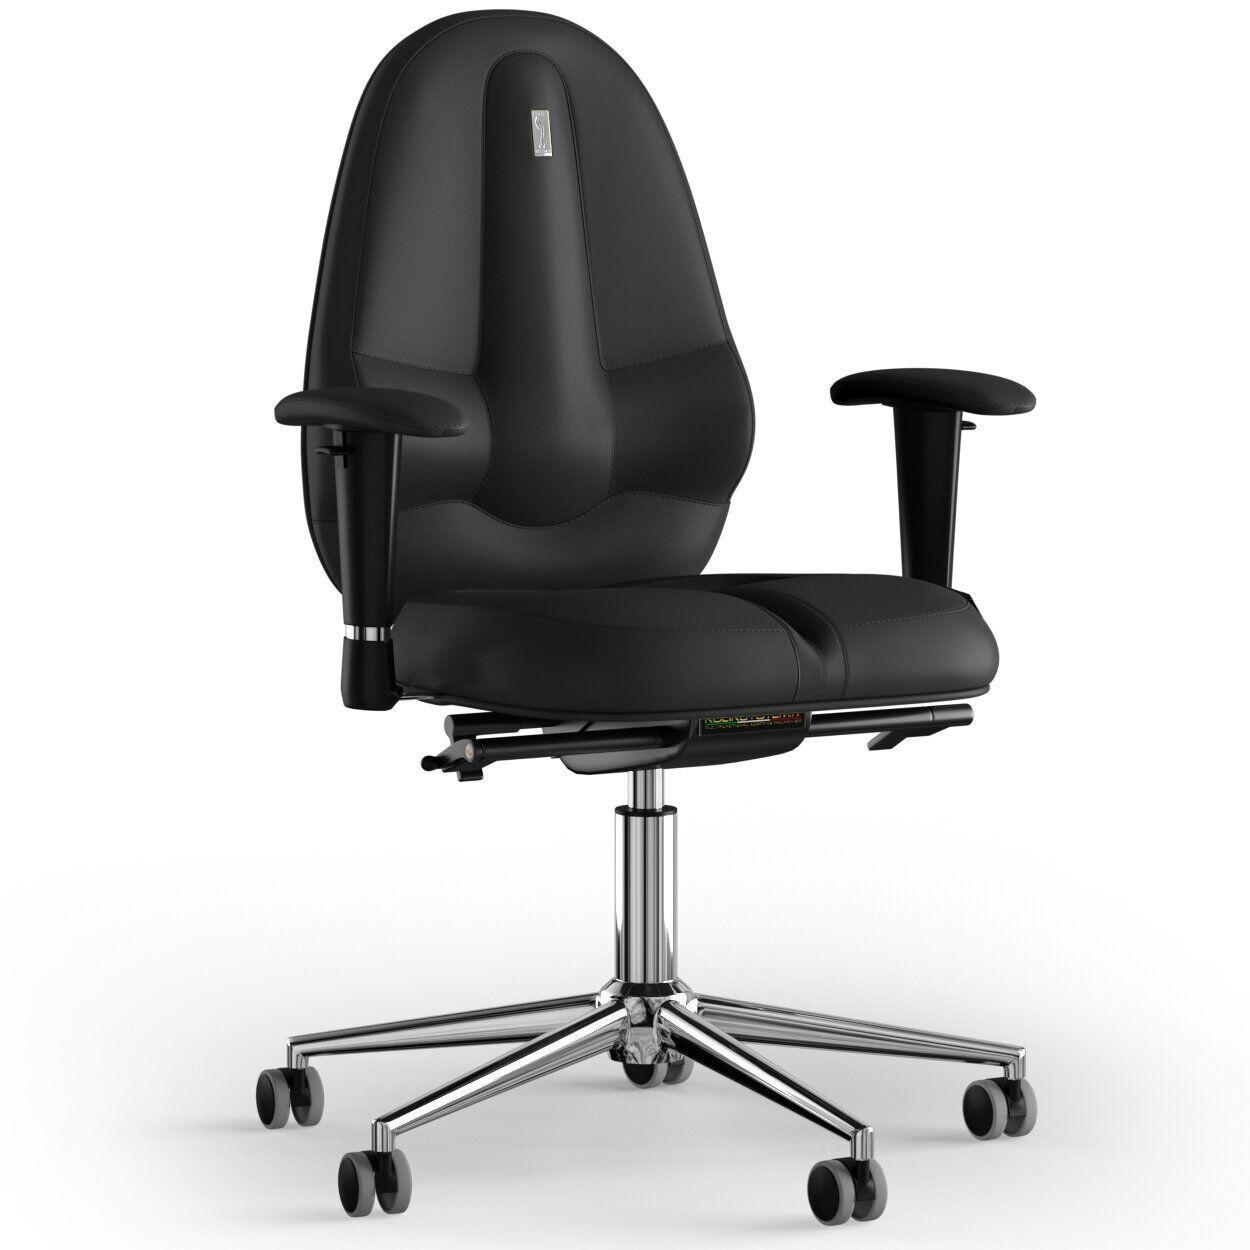 Кресло KULIK SYSTEM CLASSIC Экокожа без подголовника без строчки